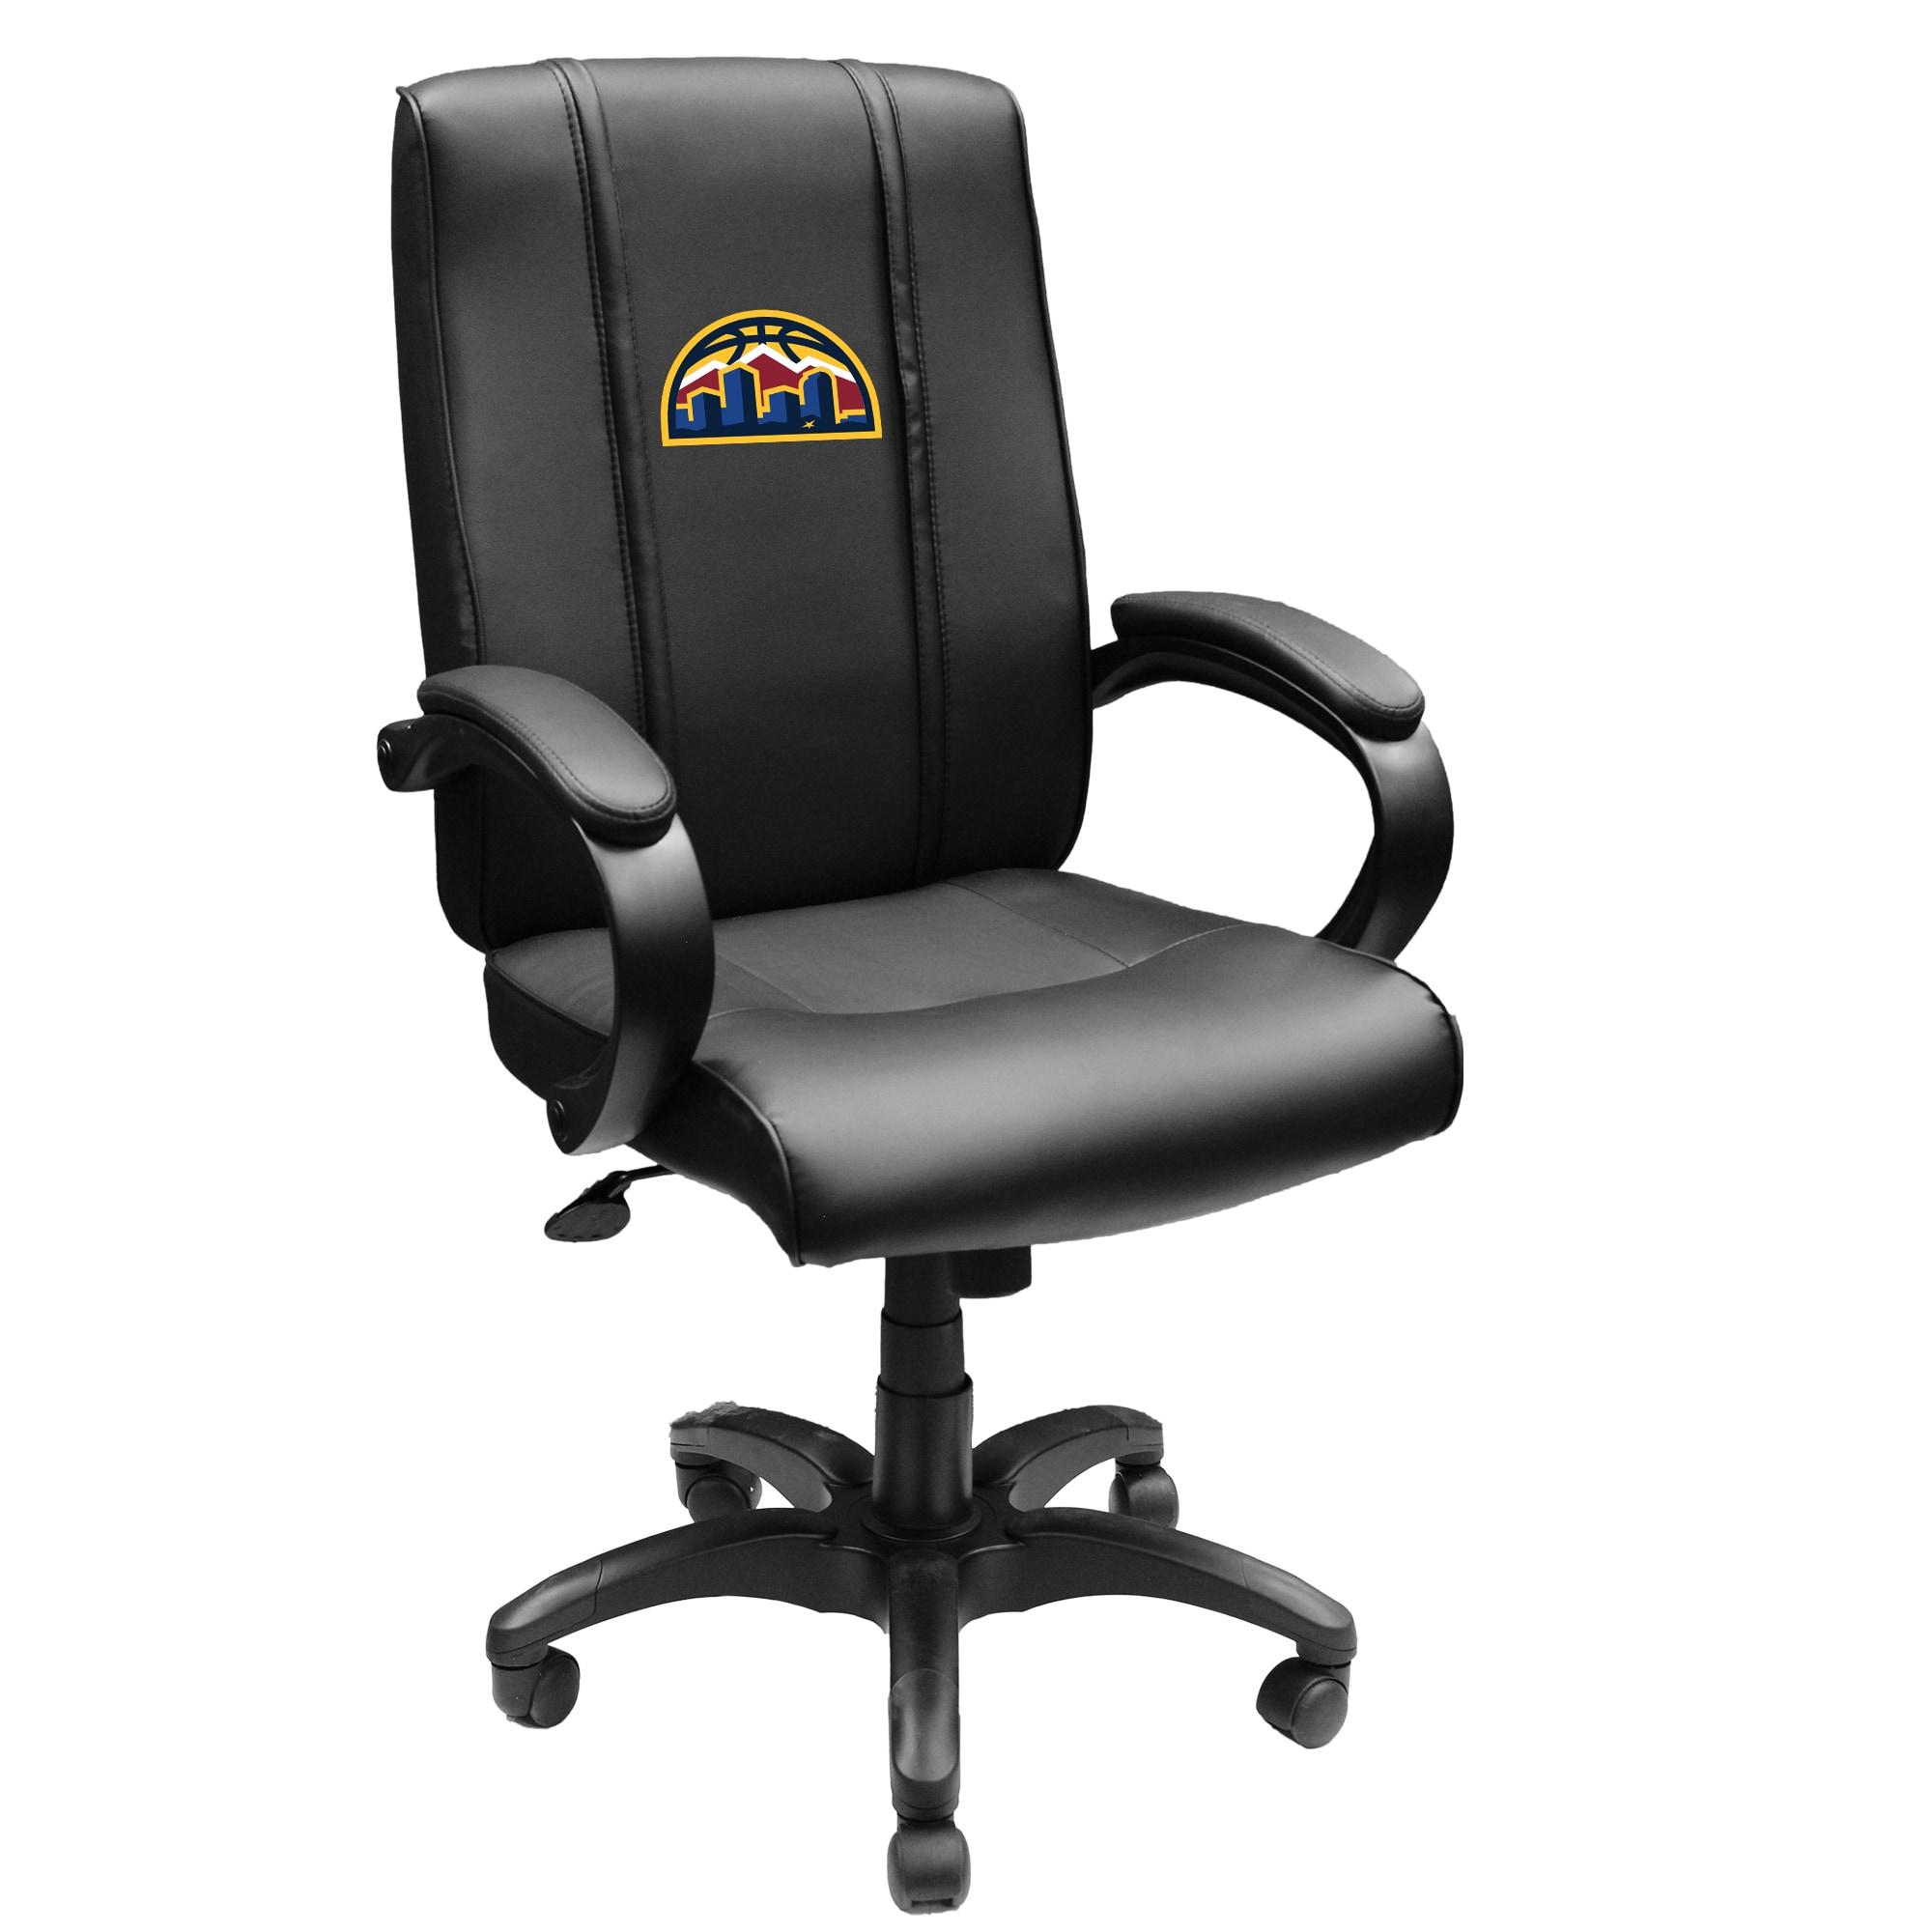 Denver Nuggets Mascot Team Office Chair 1000